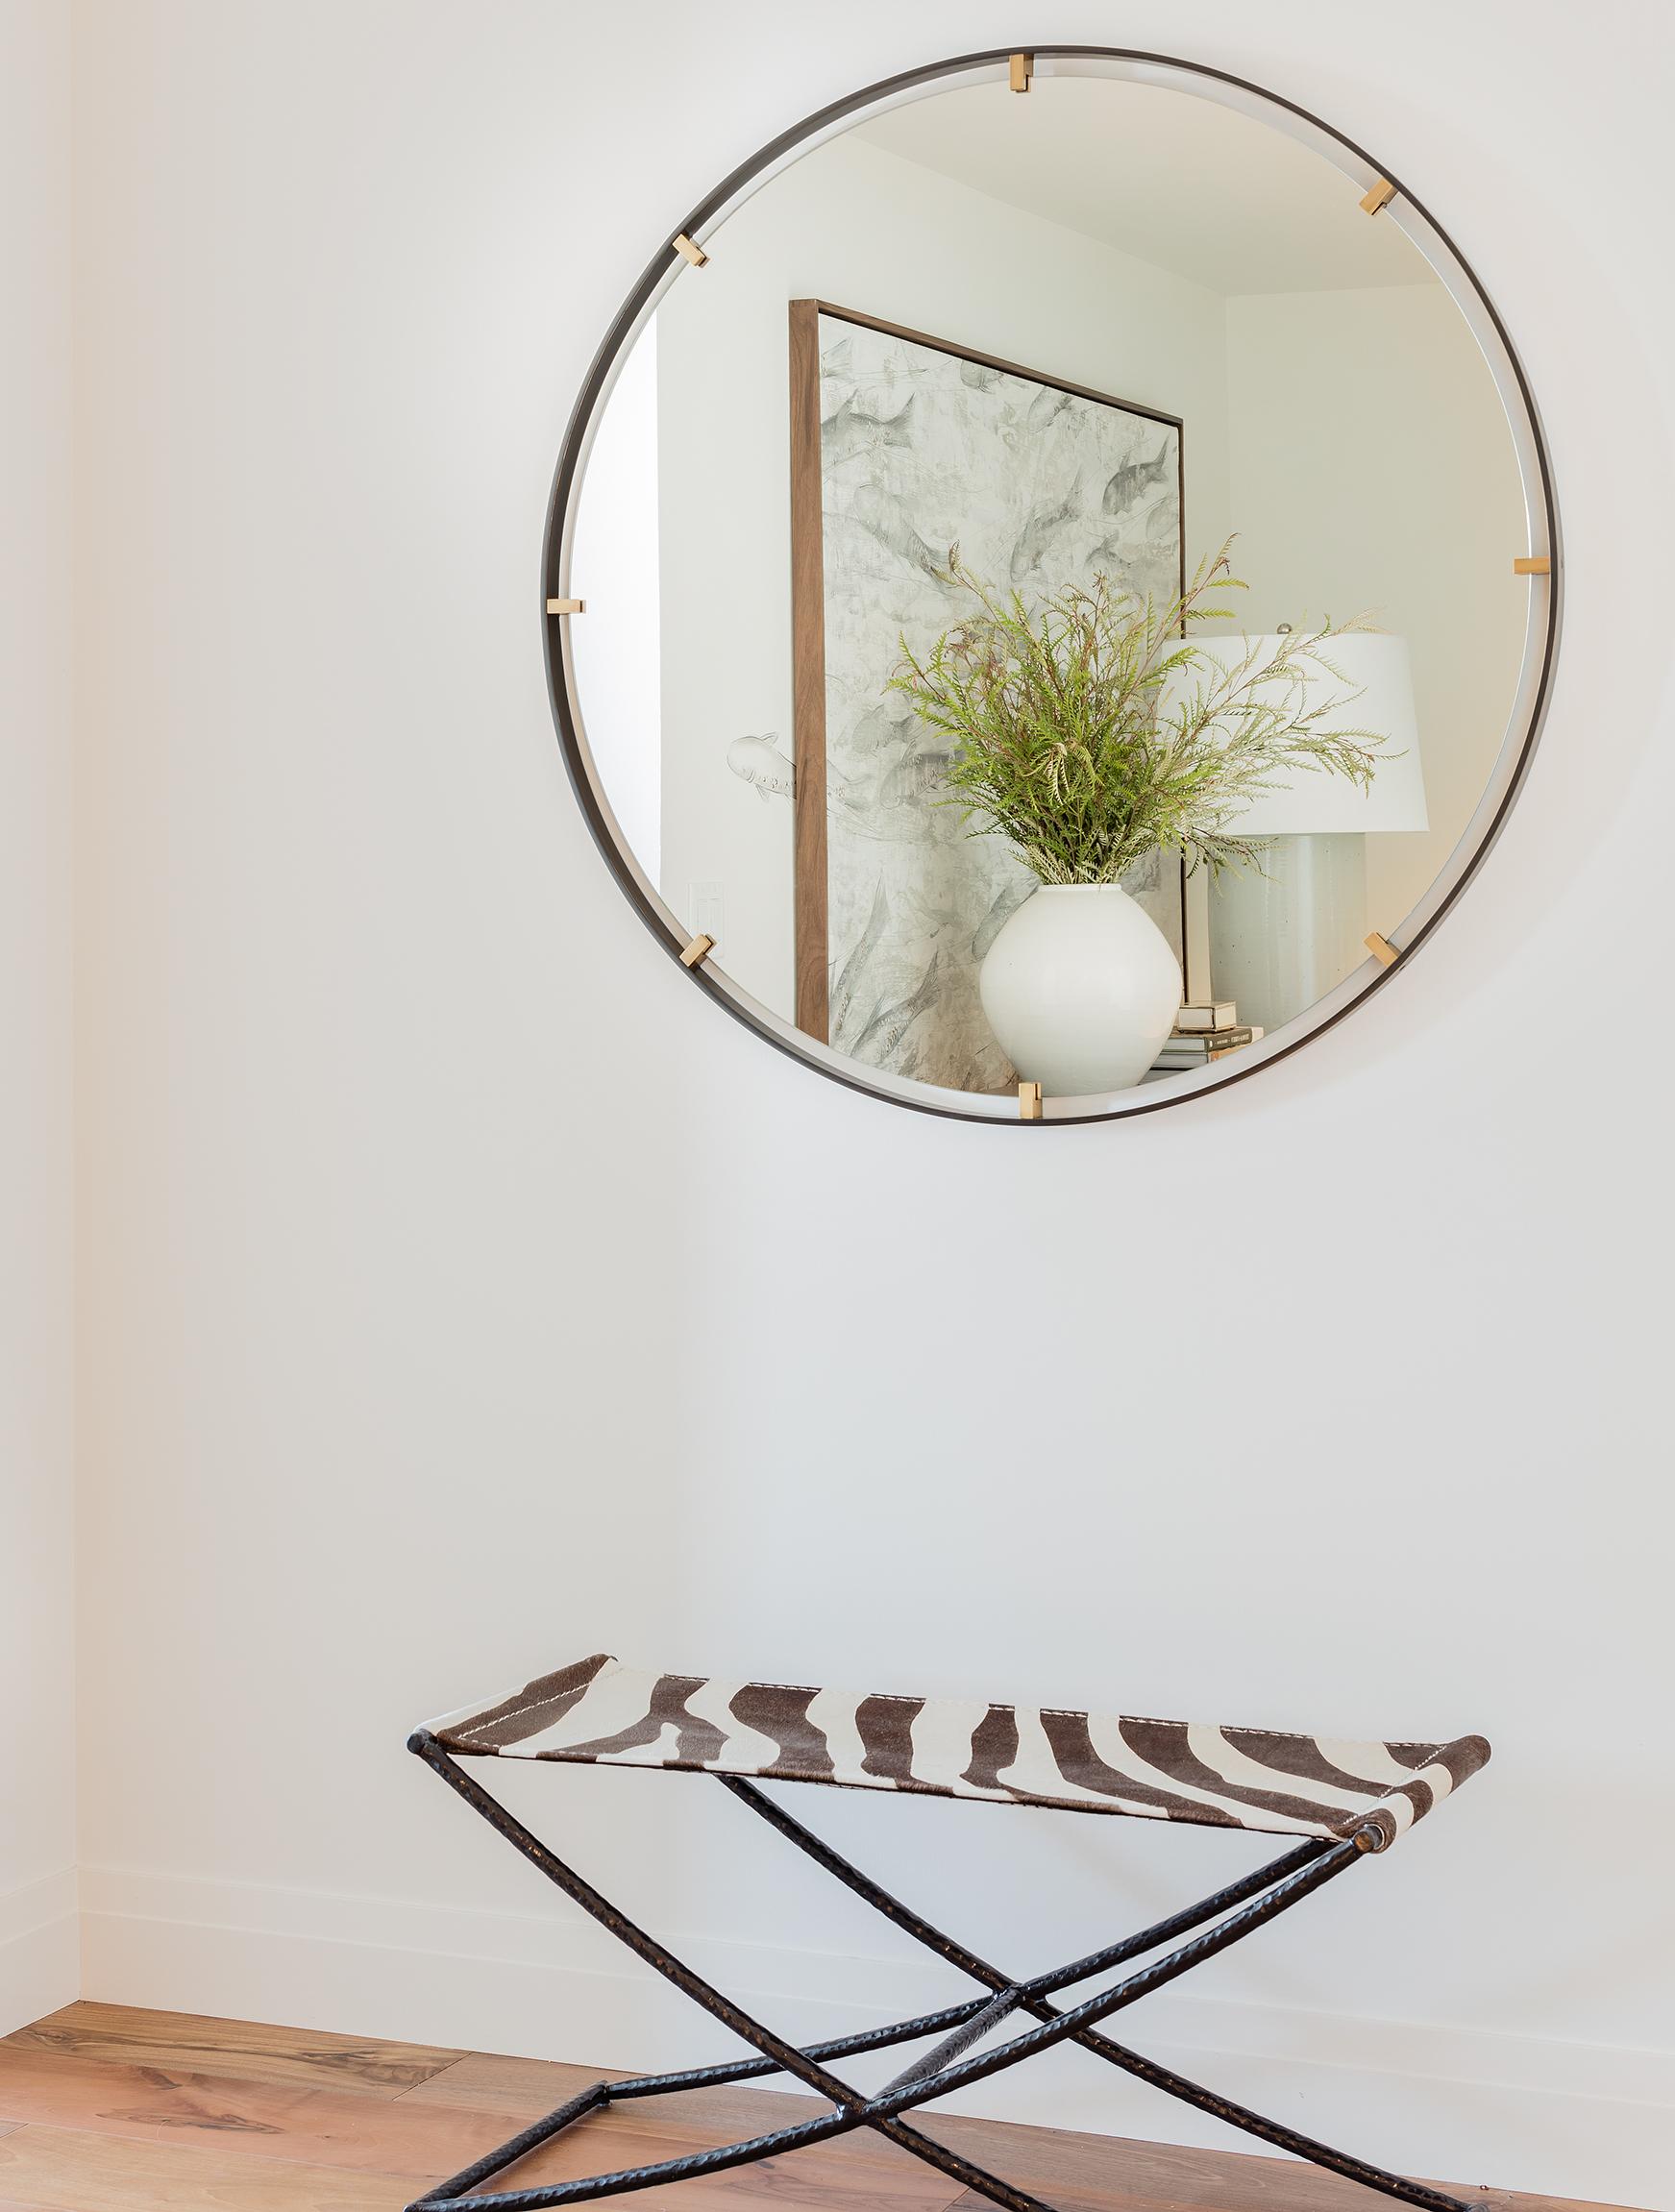 pier-4-model-foyer-bench-hudson-interior-designs.jpg